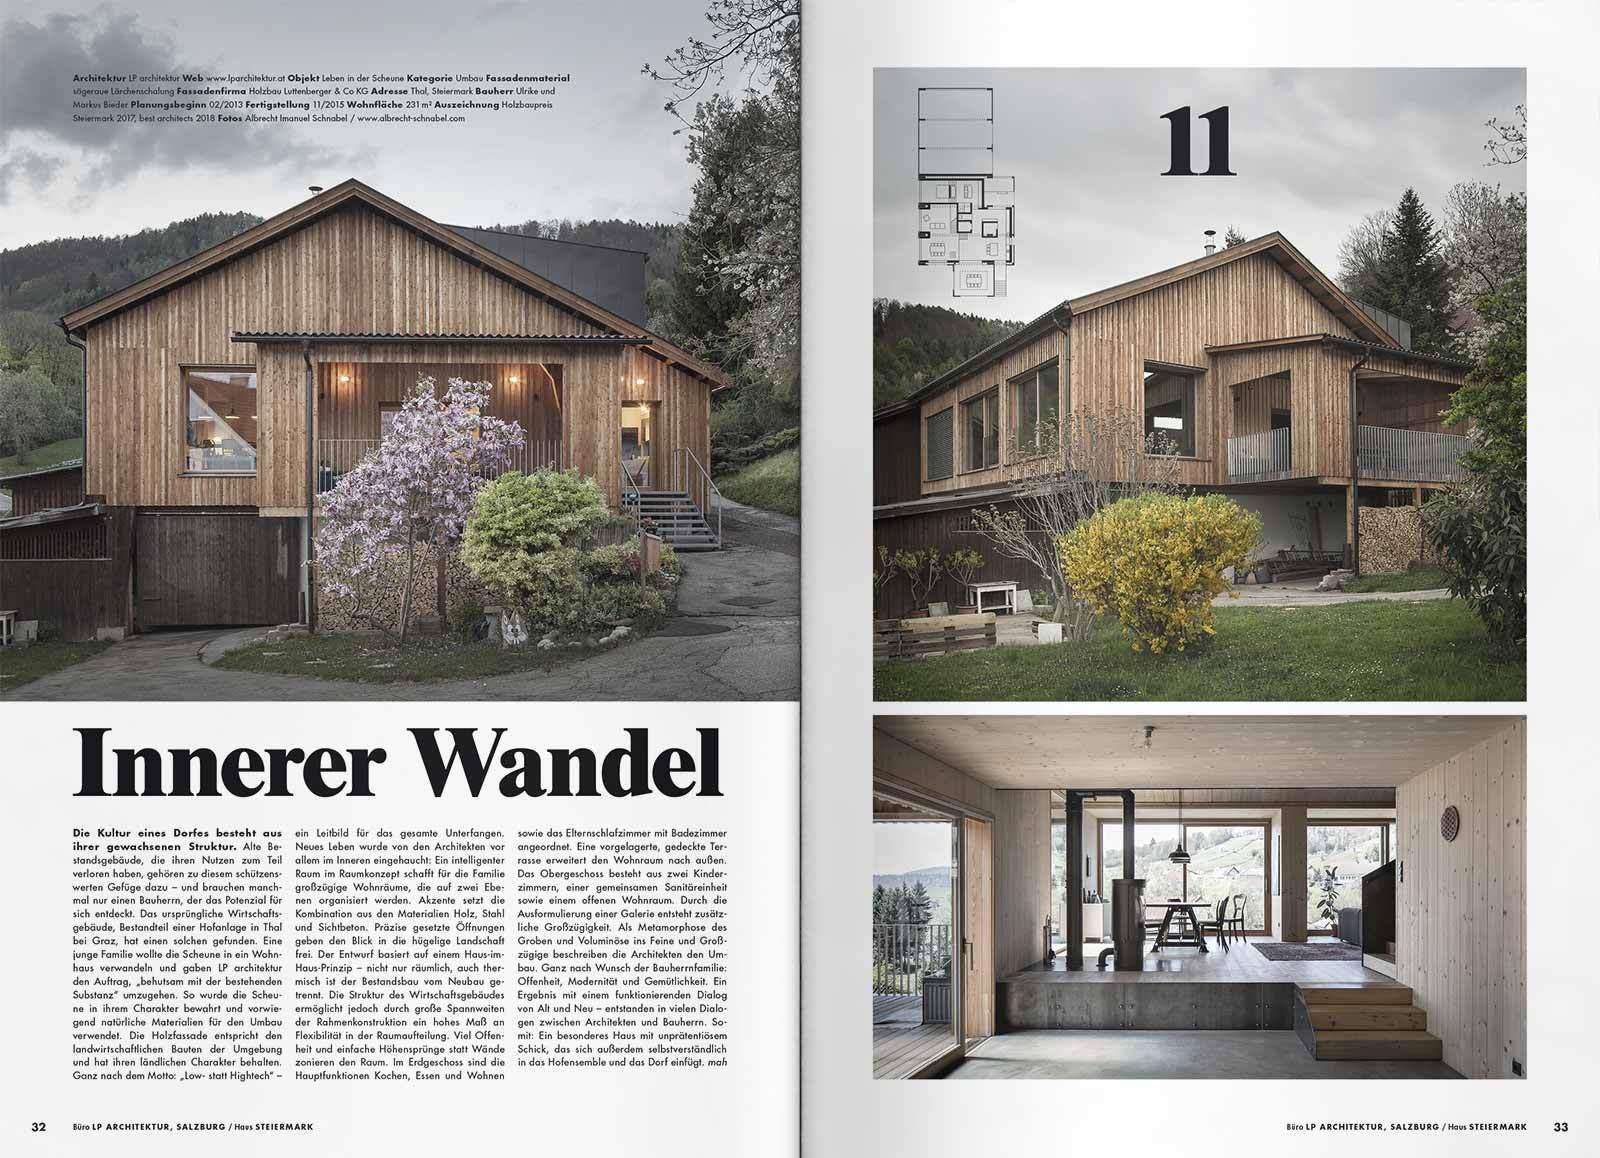 Haeuser2018 spread14